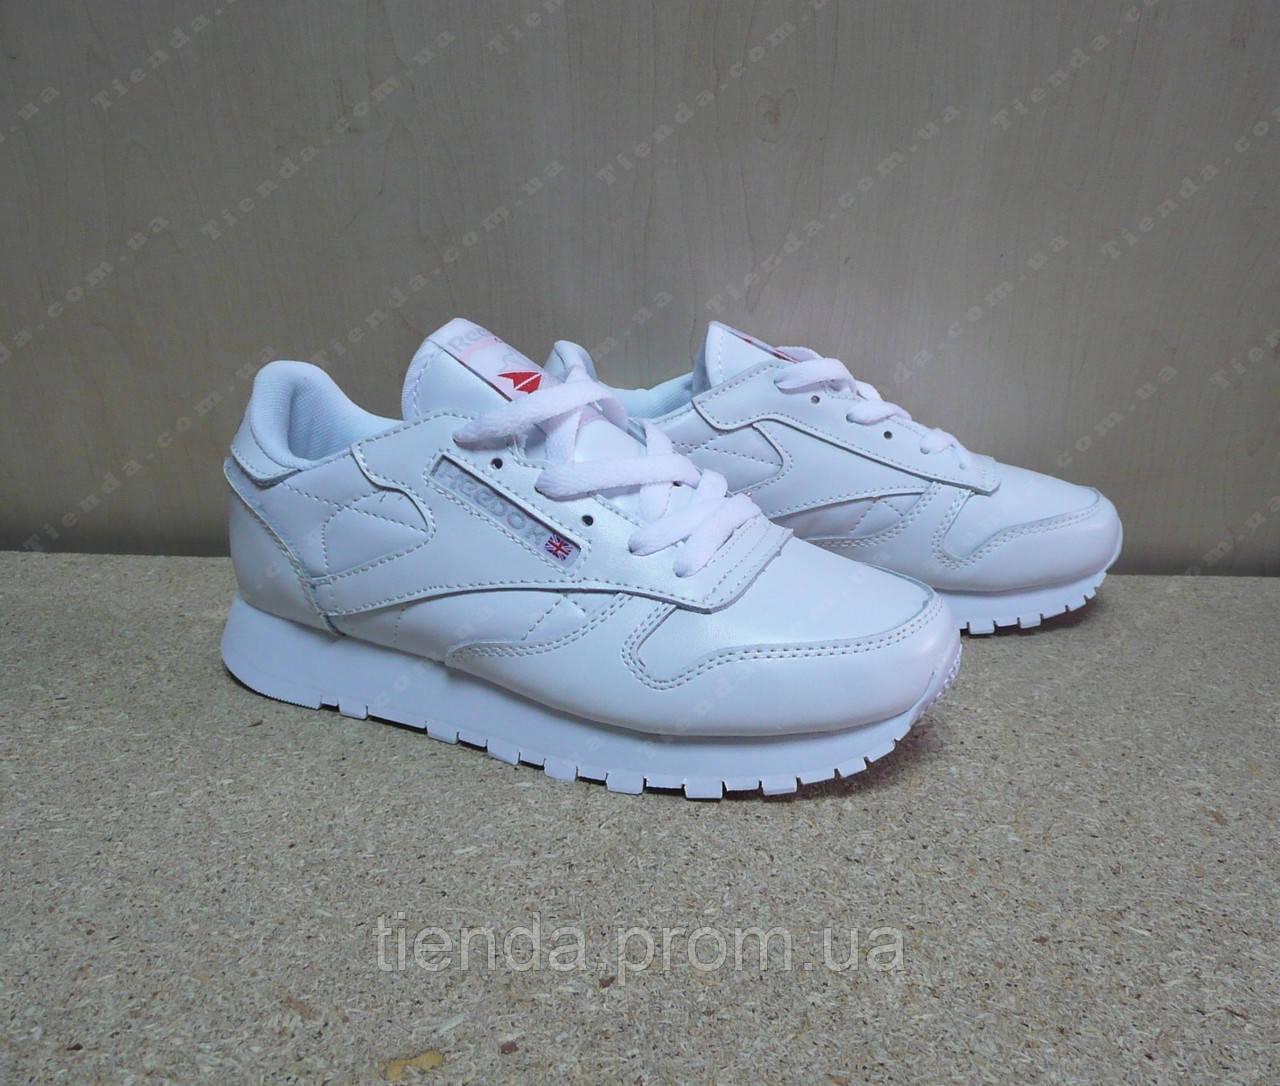 Женские Кроссовки Reebok Classic Leather белые  продажа, цена в ... 7481dd3f254